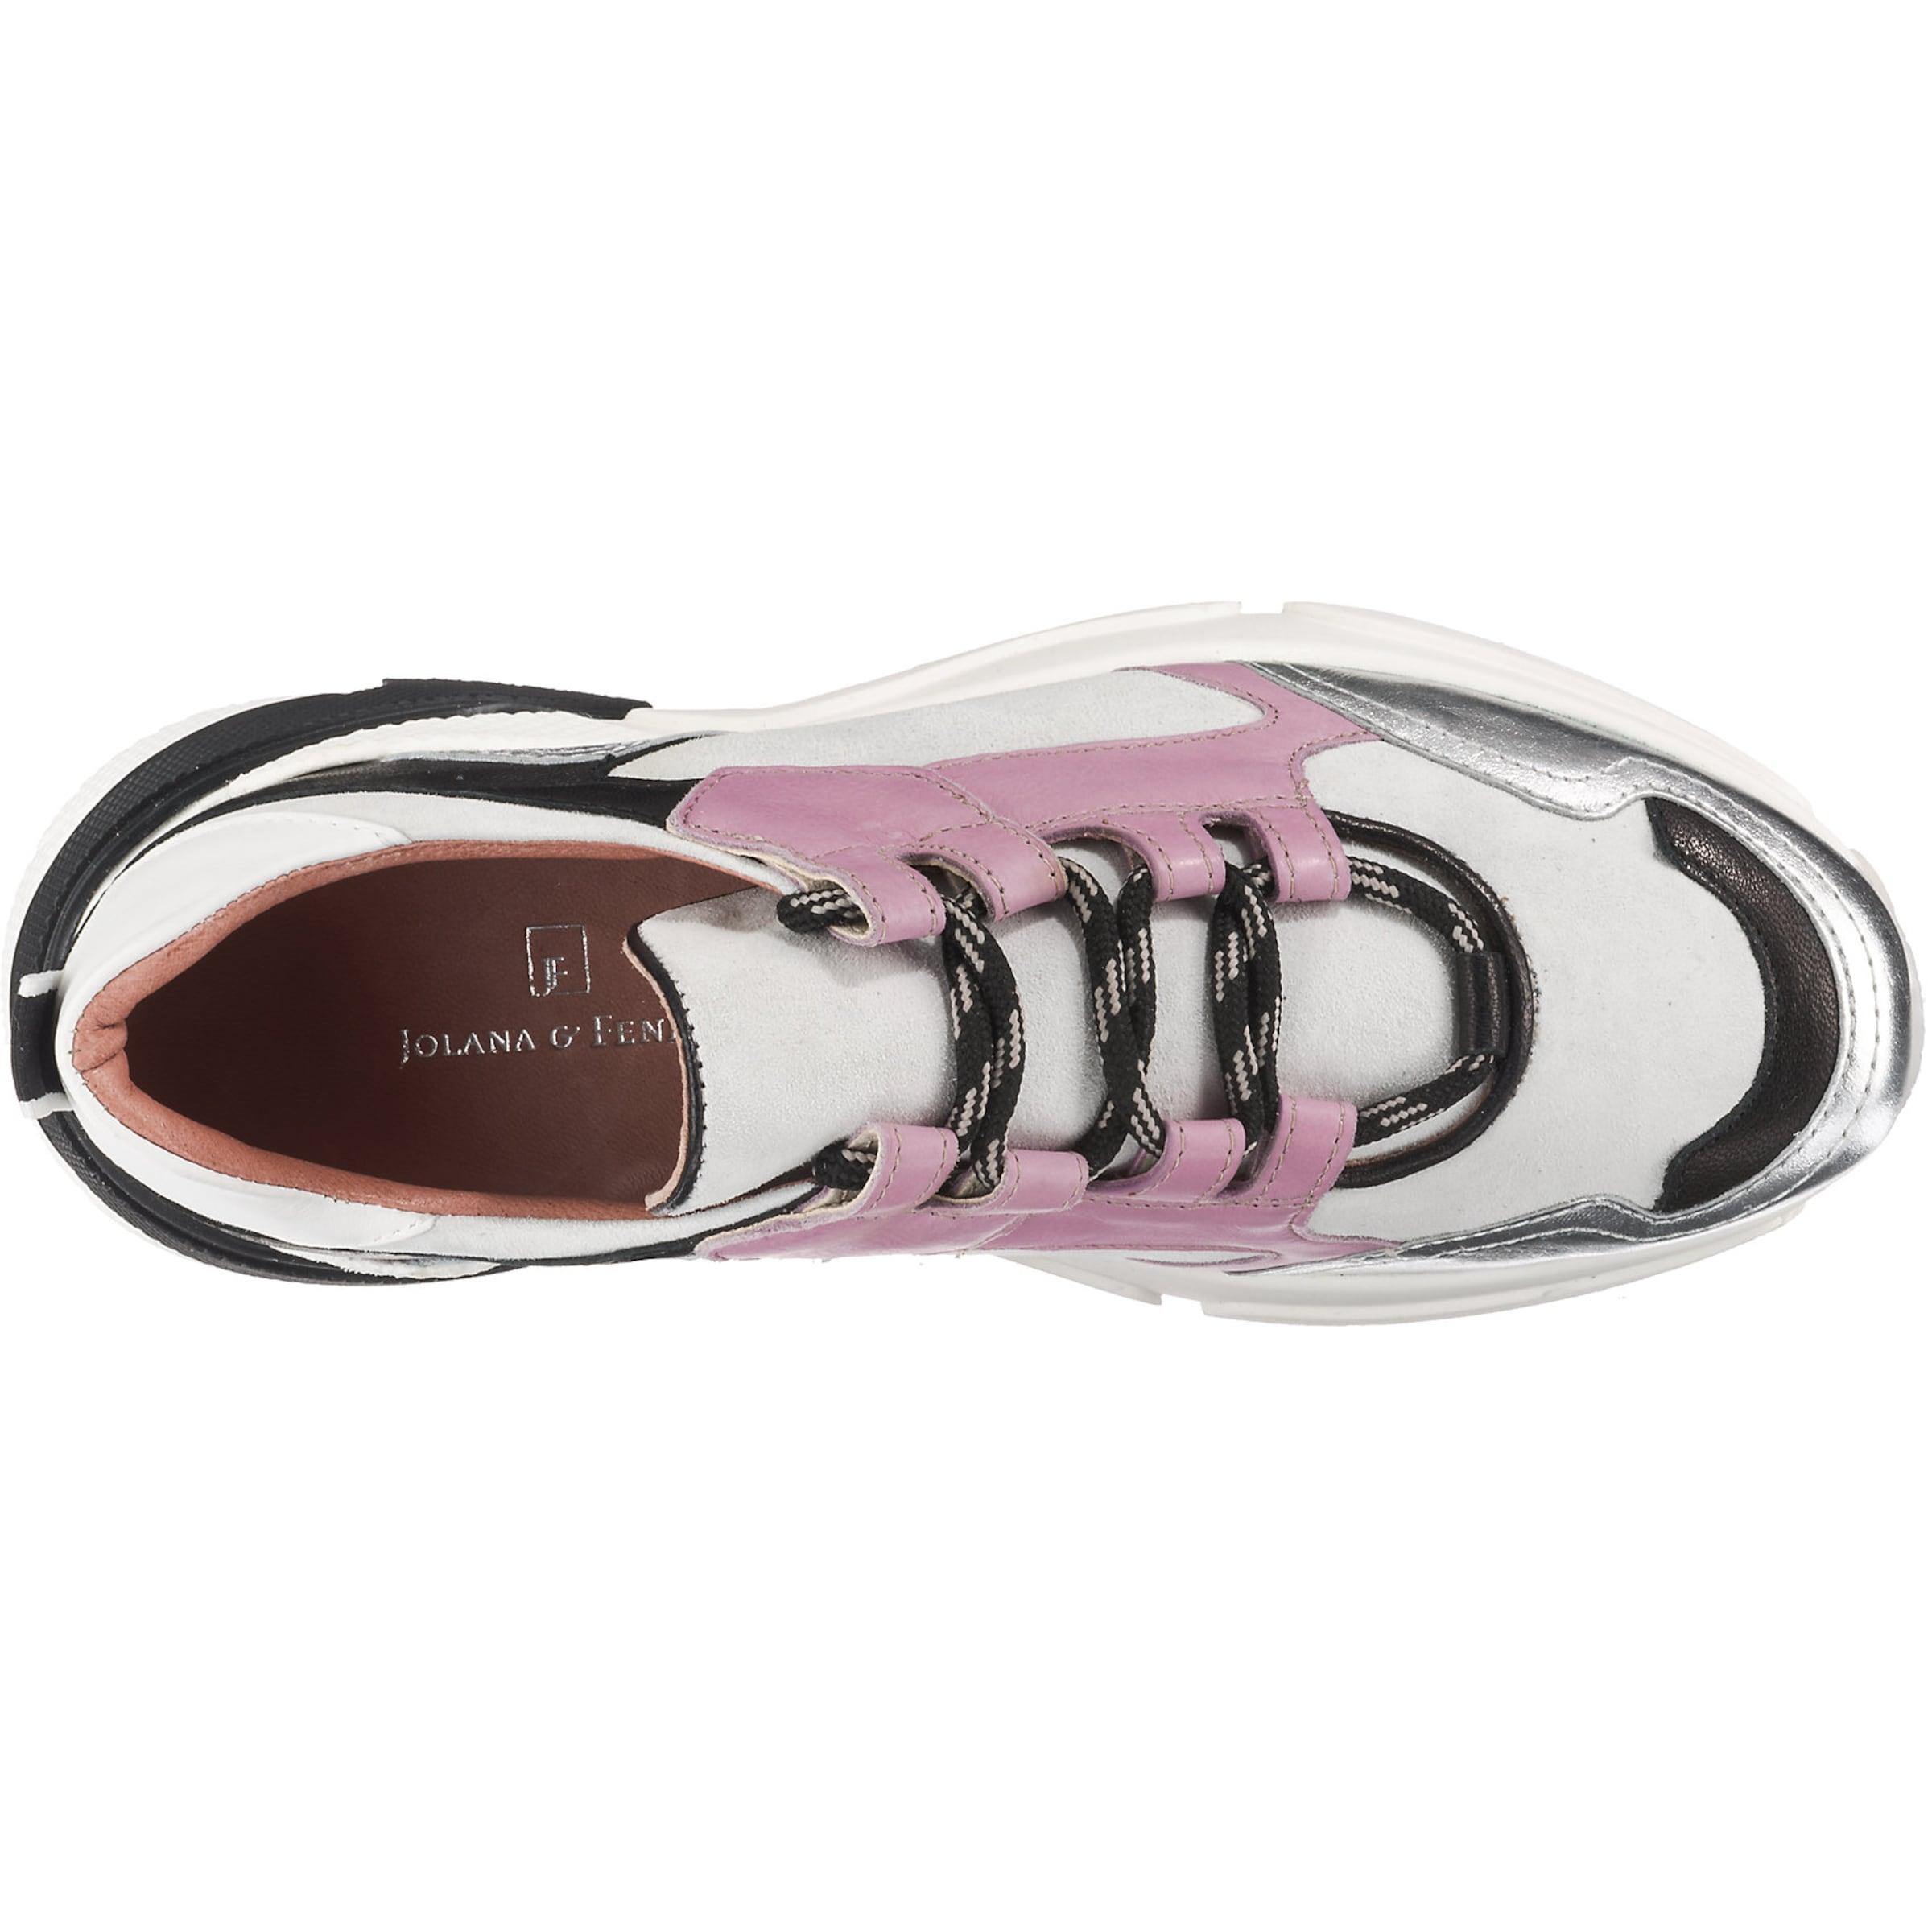 In Fenena Silber Sneakers Jolanaamp; Schwarz HellgrauHellpink 5LjSc3R4Aq